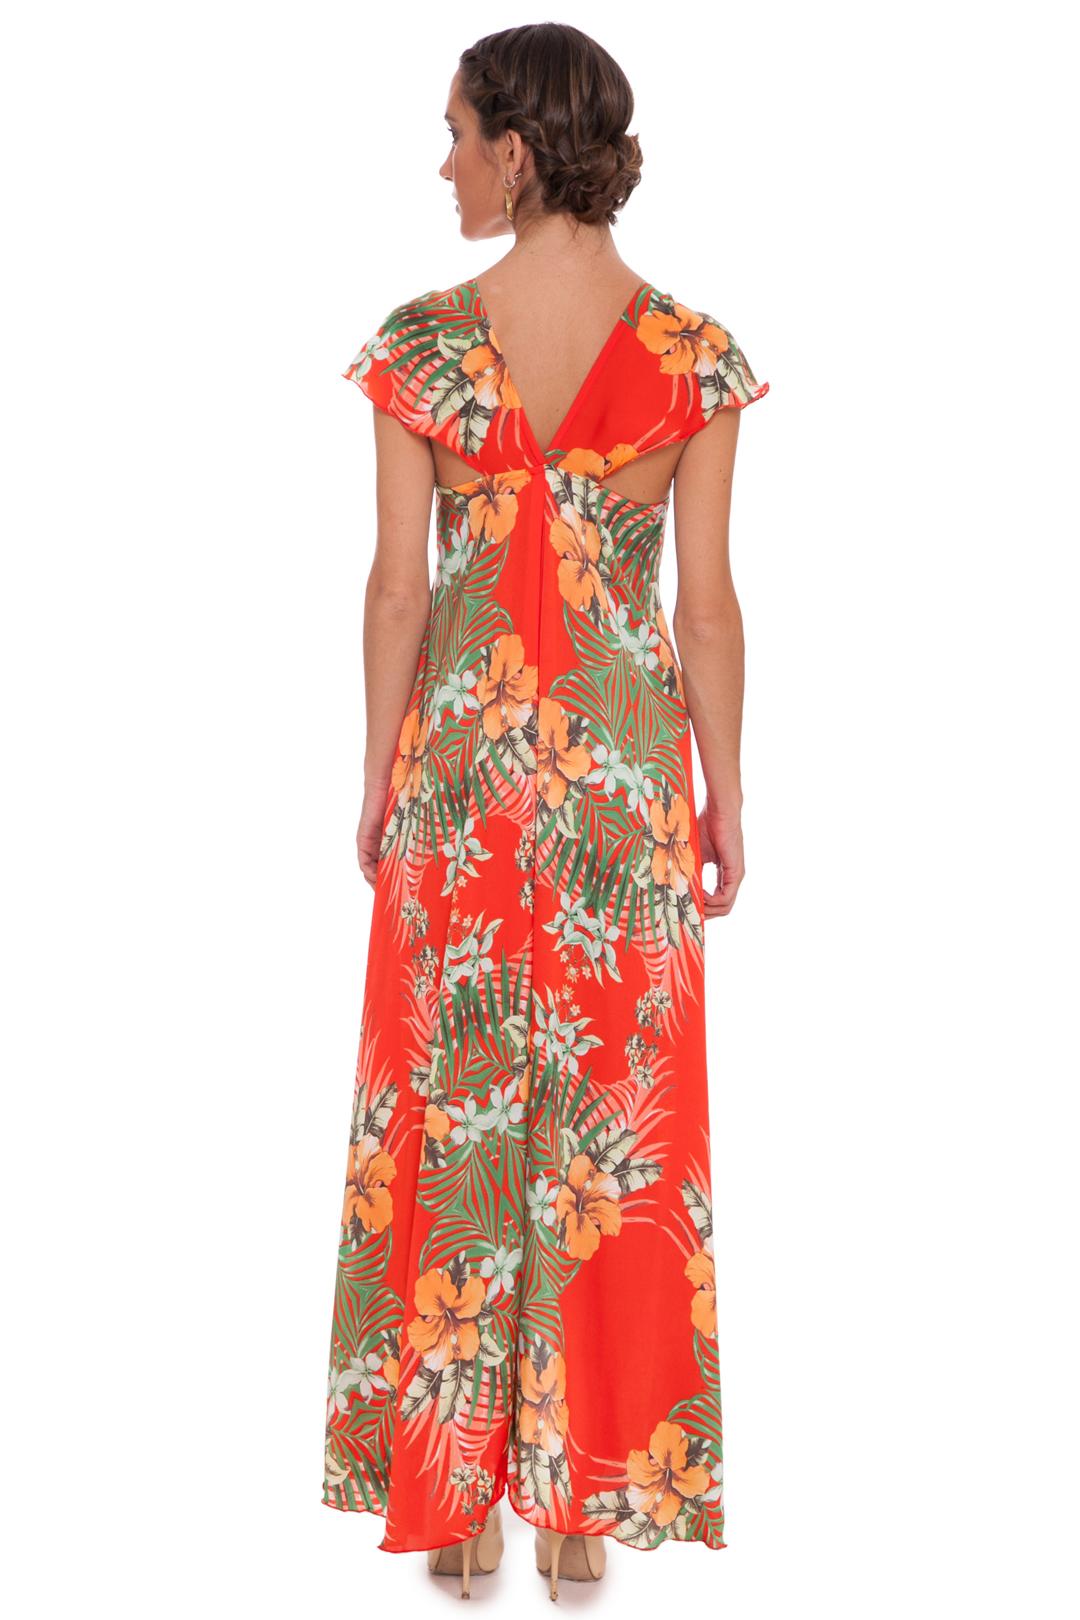 left -  Vestido Tropical Orange